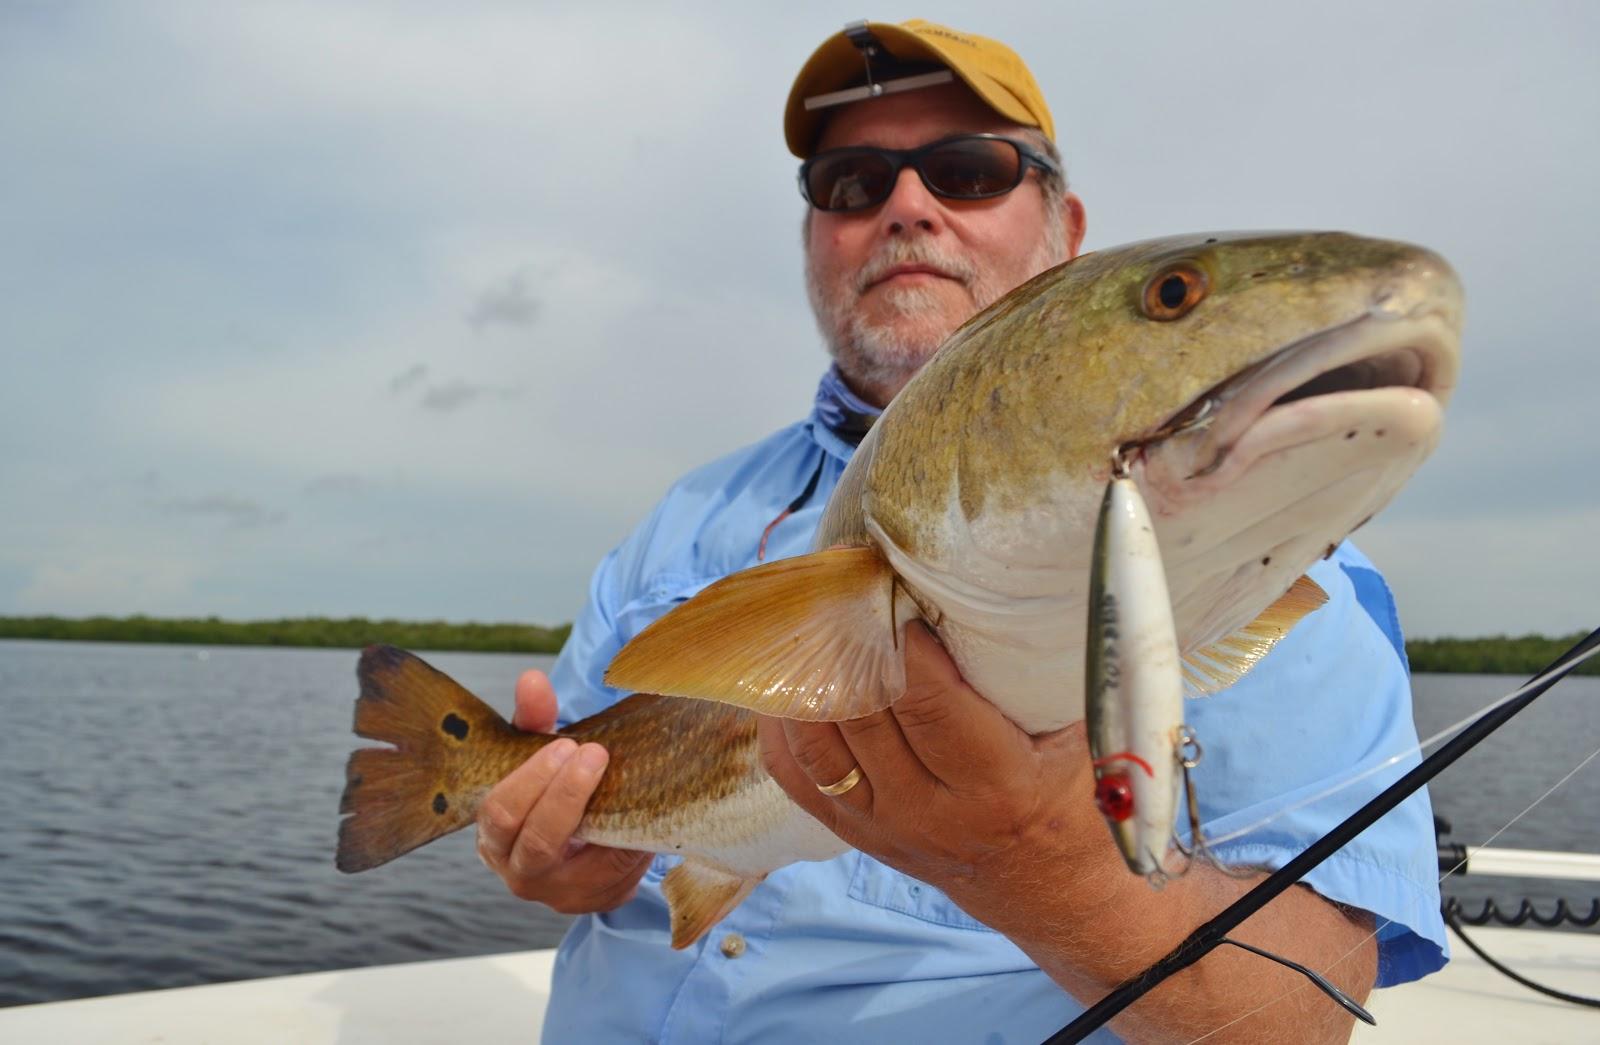 The pine island angler matlacha fishing report topwater slam for Secret fishing spots near me